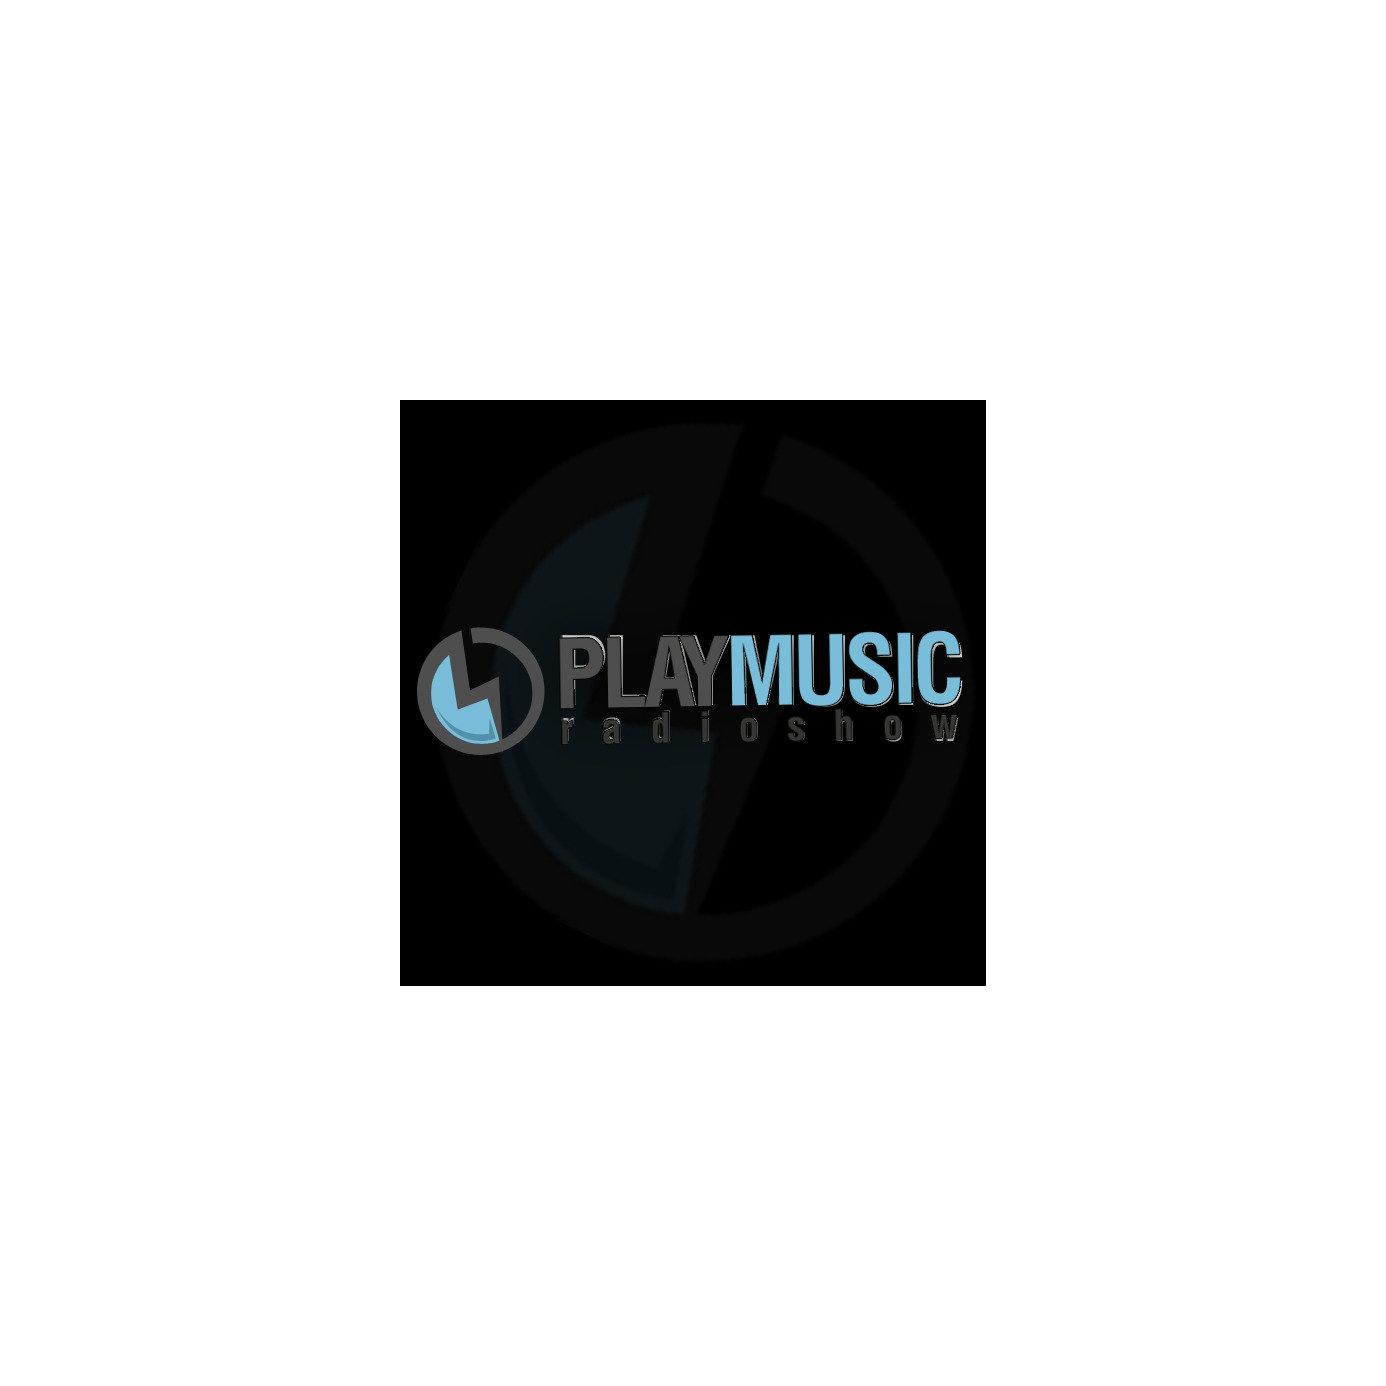 <![CDATA[PlayMusic Radio Show by MrDanny]]>